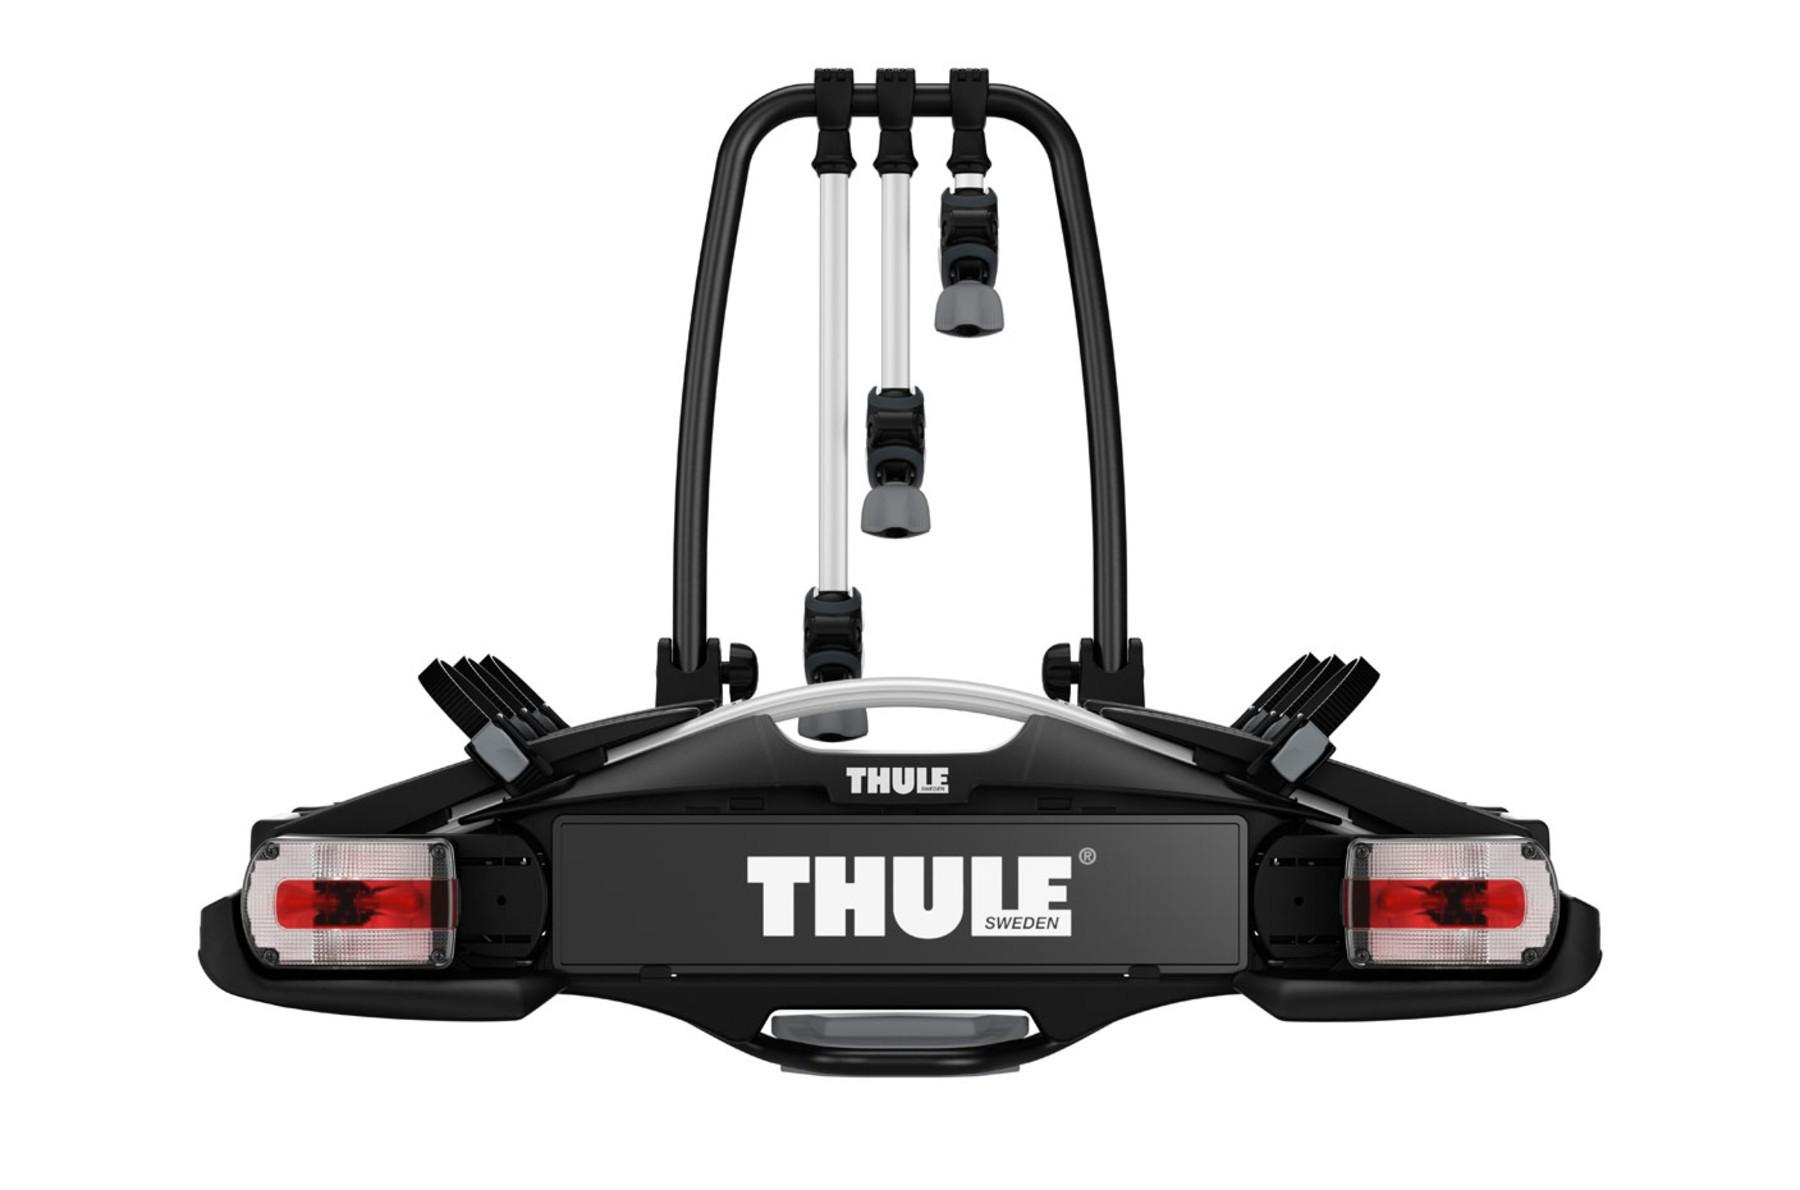 Suporte transbike Thule velo compact  927 P/ 3 bike Engate